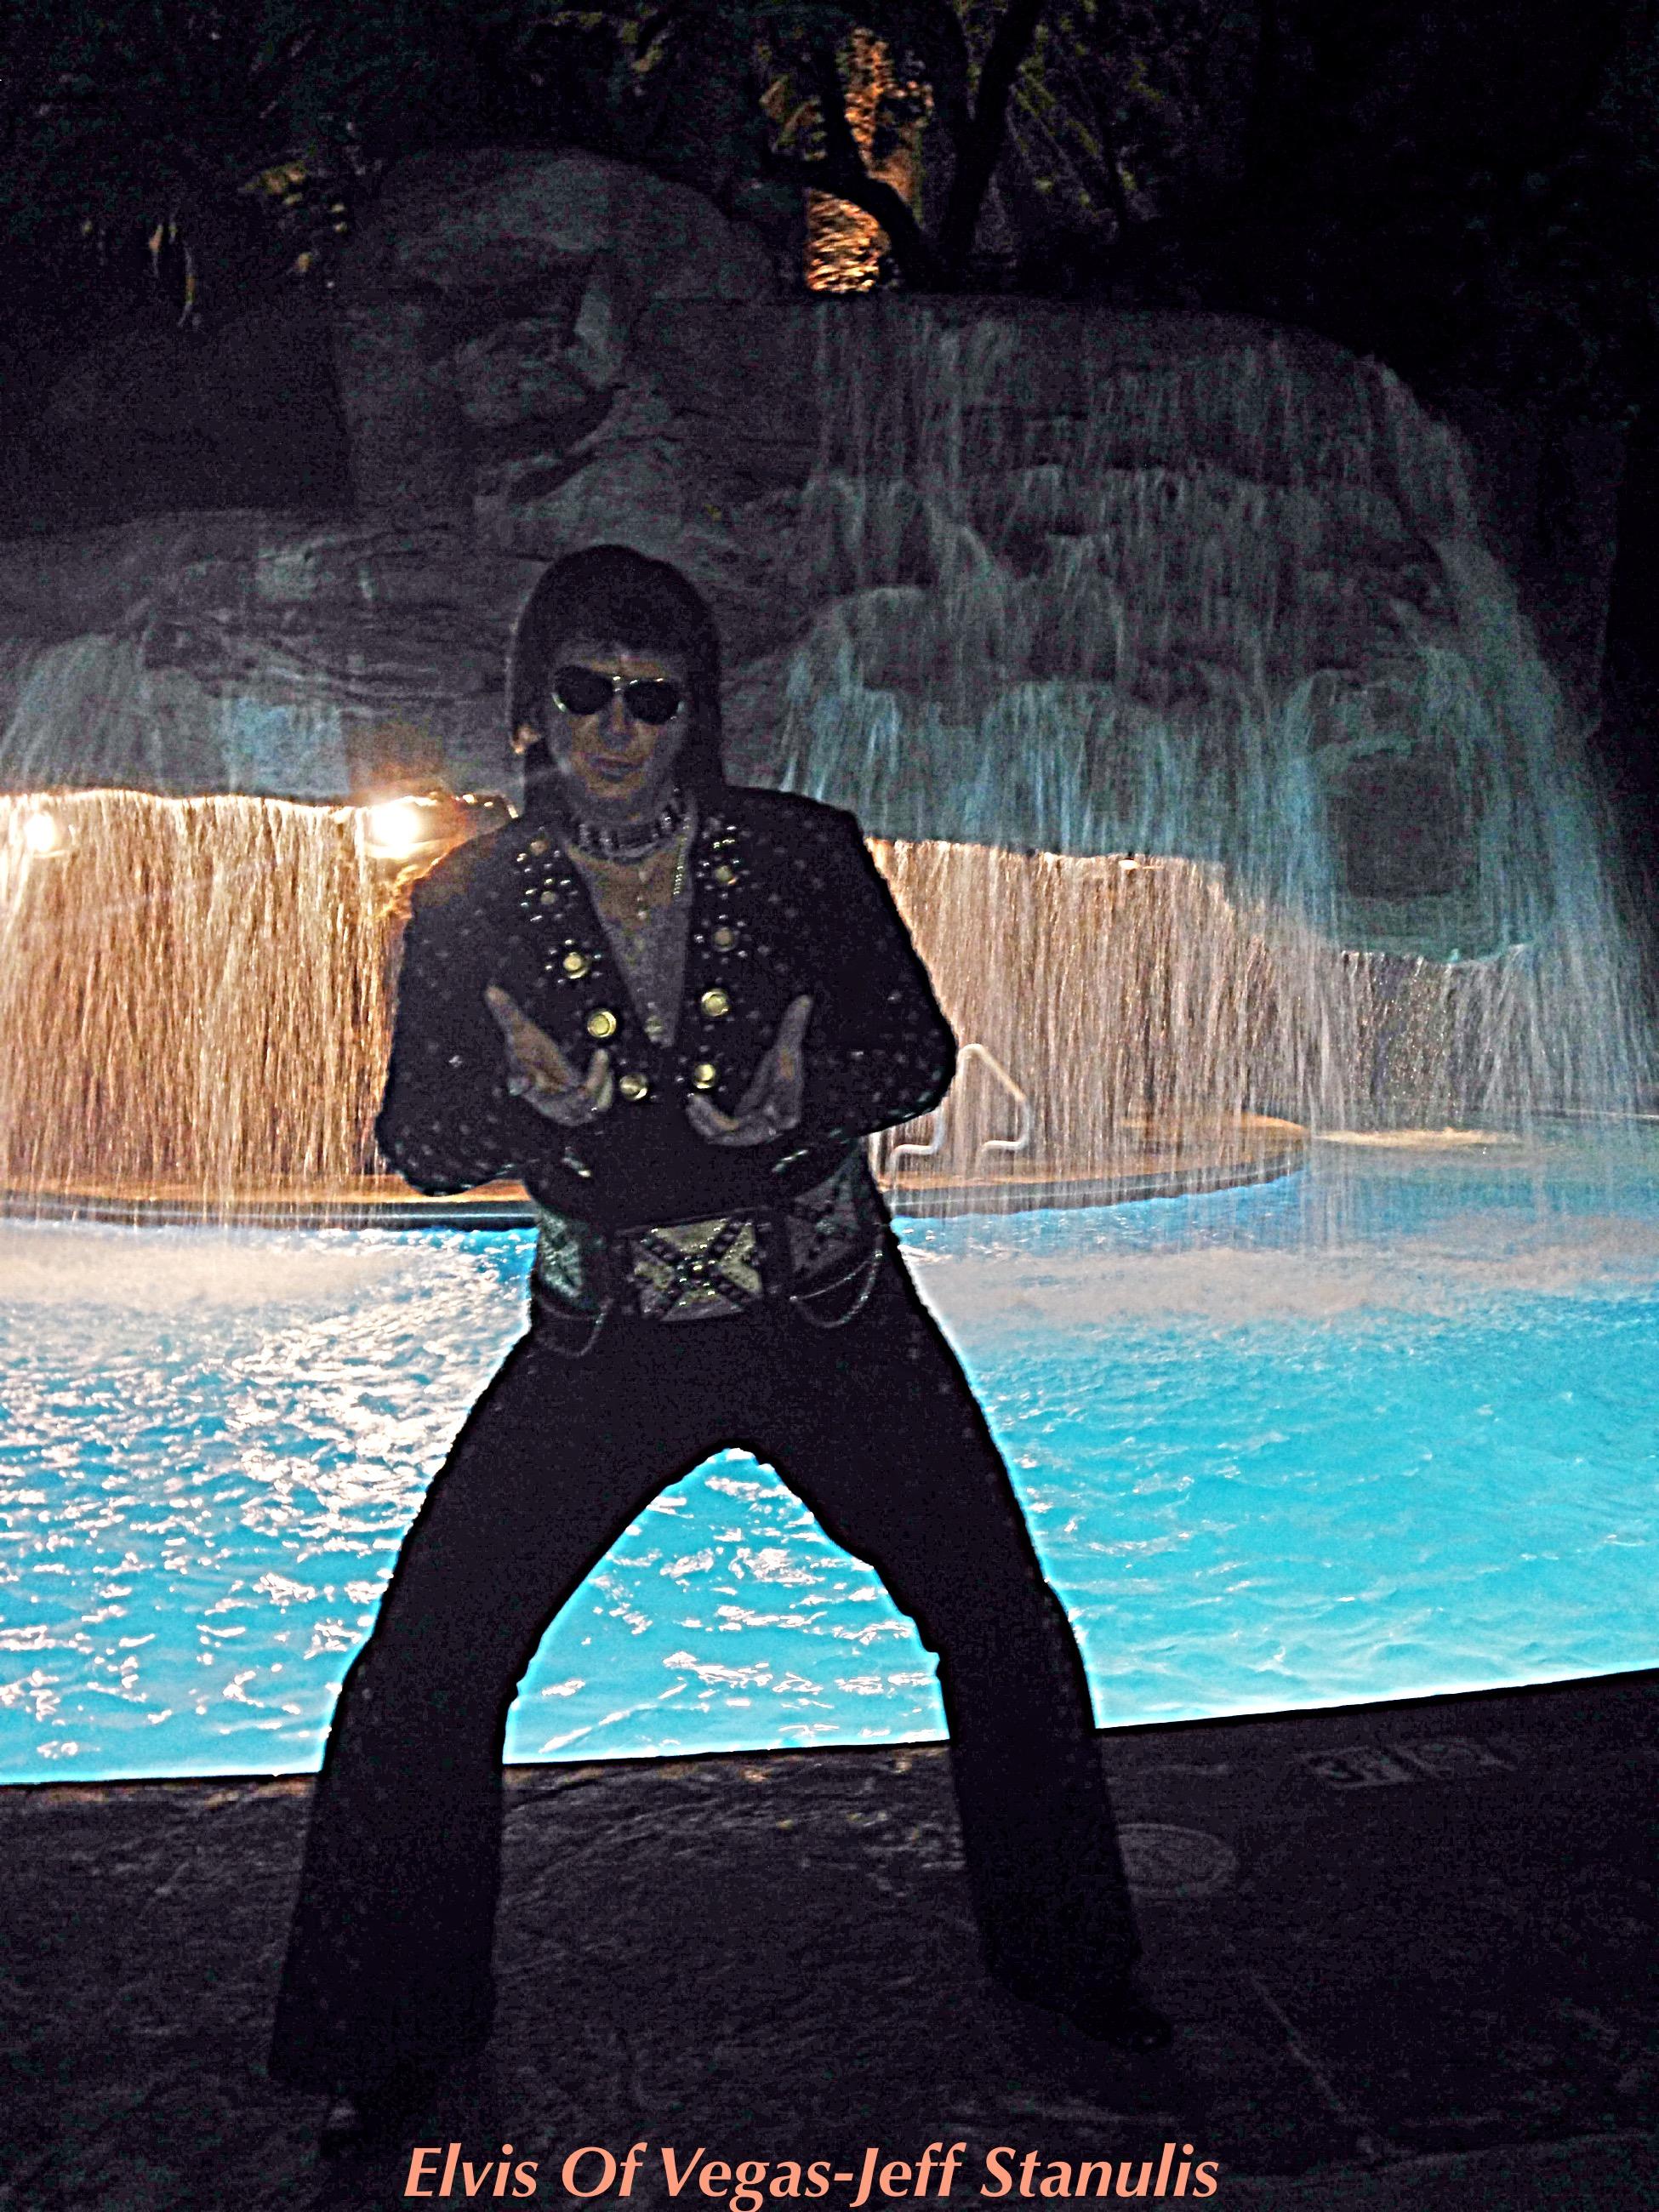 Elvis Of Vegas-Jeff Stanulis